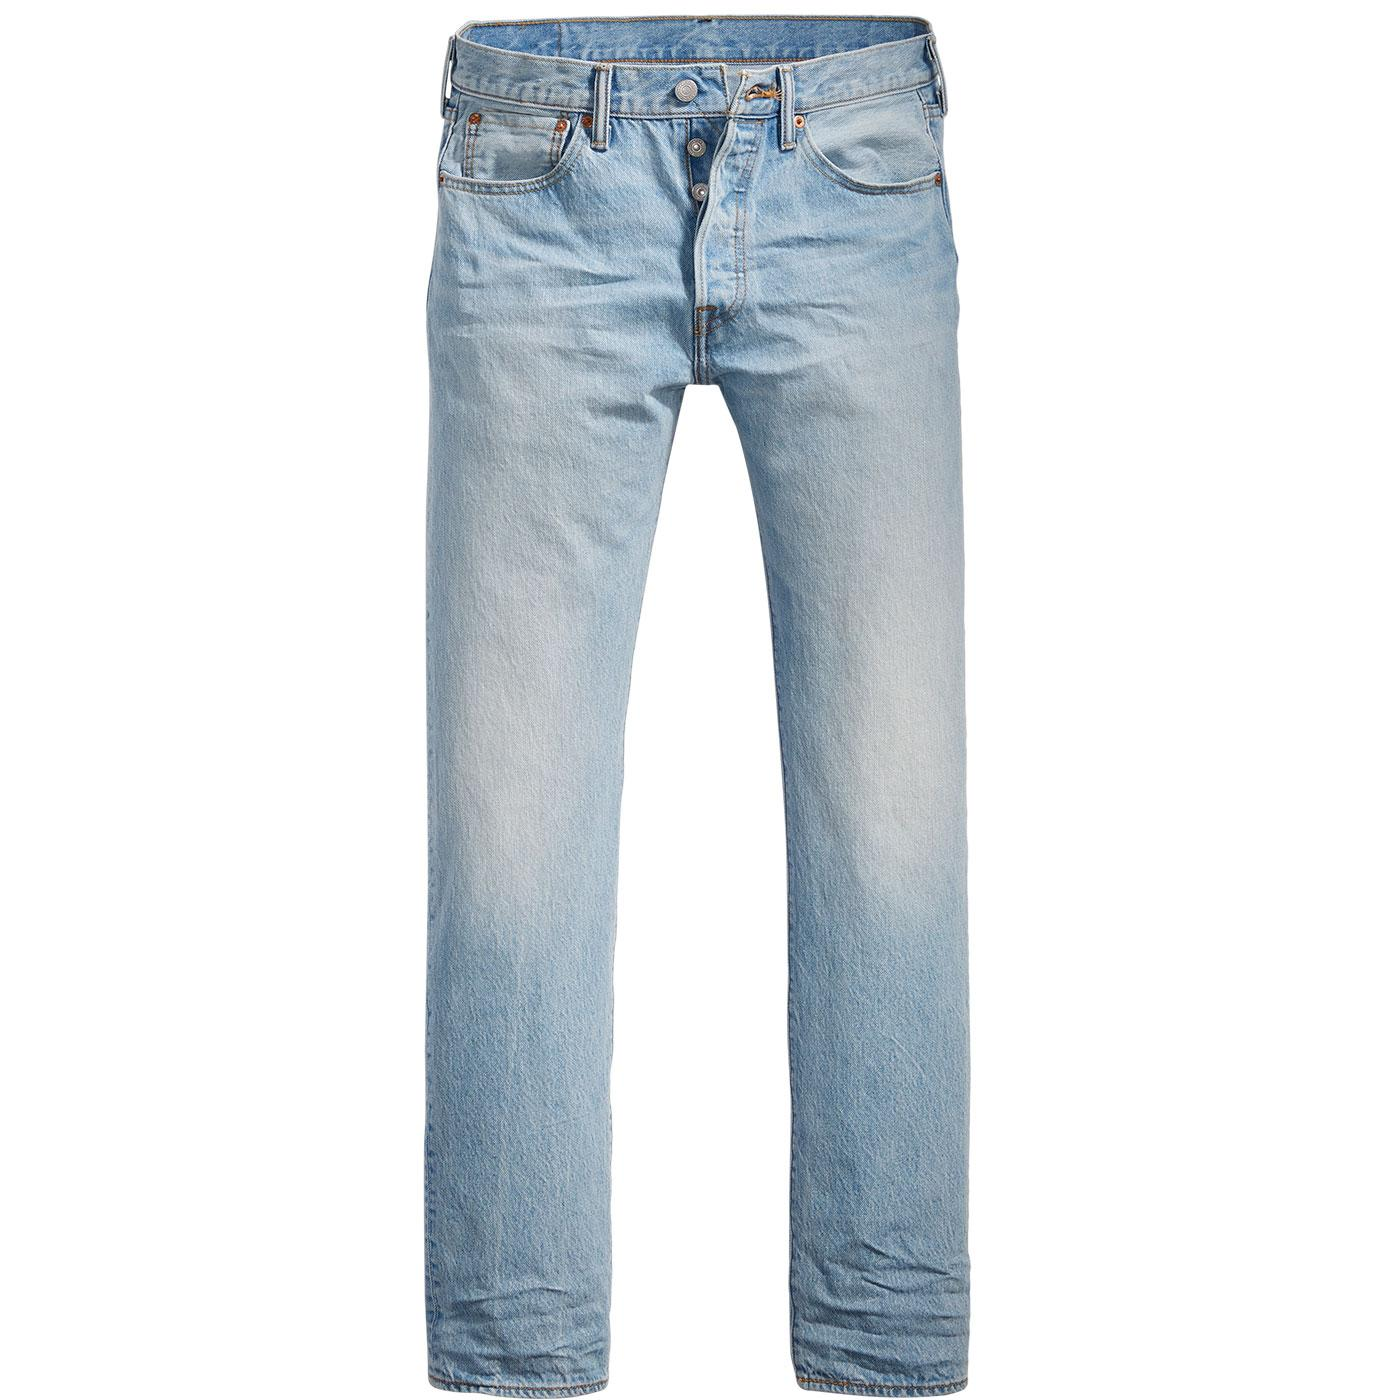 LEVI'S 501 Original Straight Denim Jeans TOMAHAWK